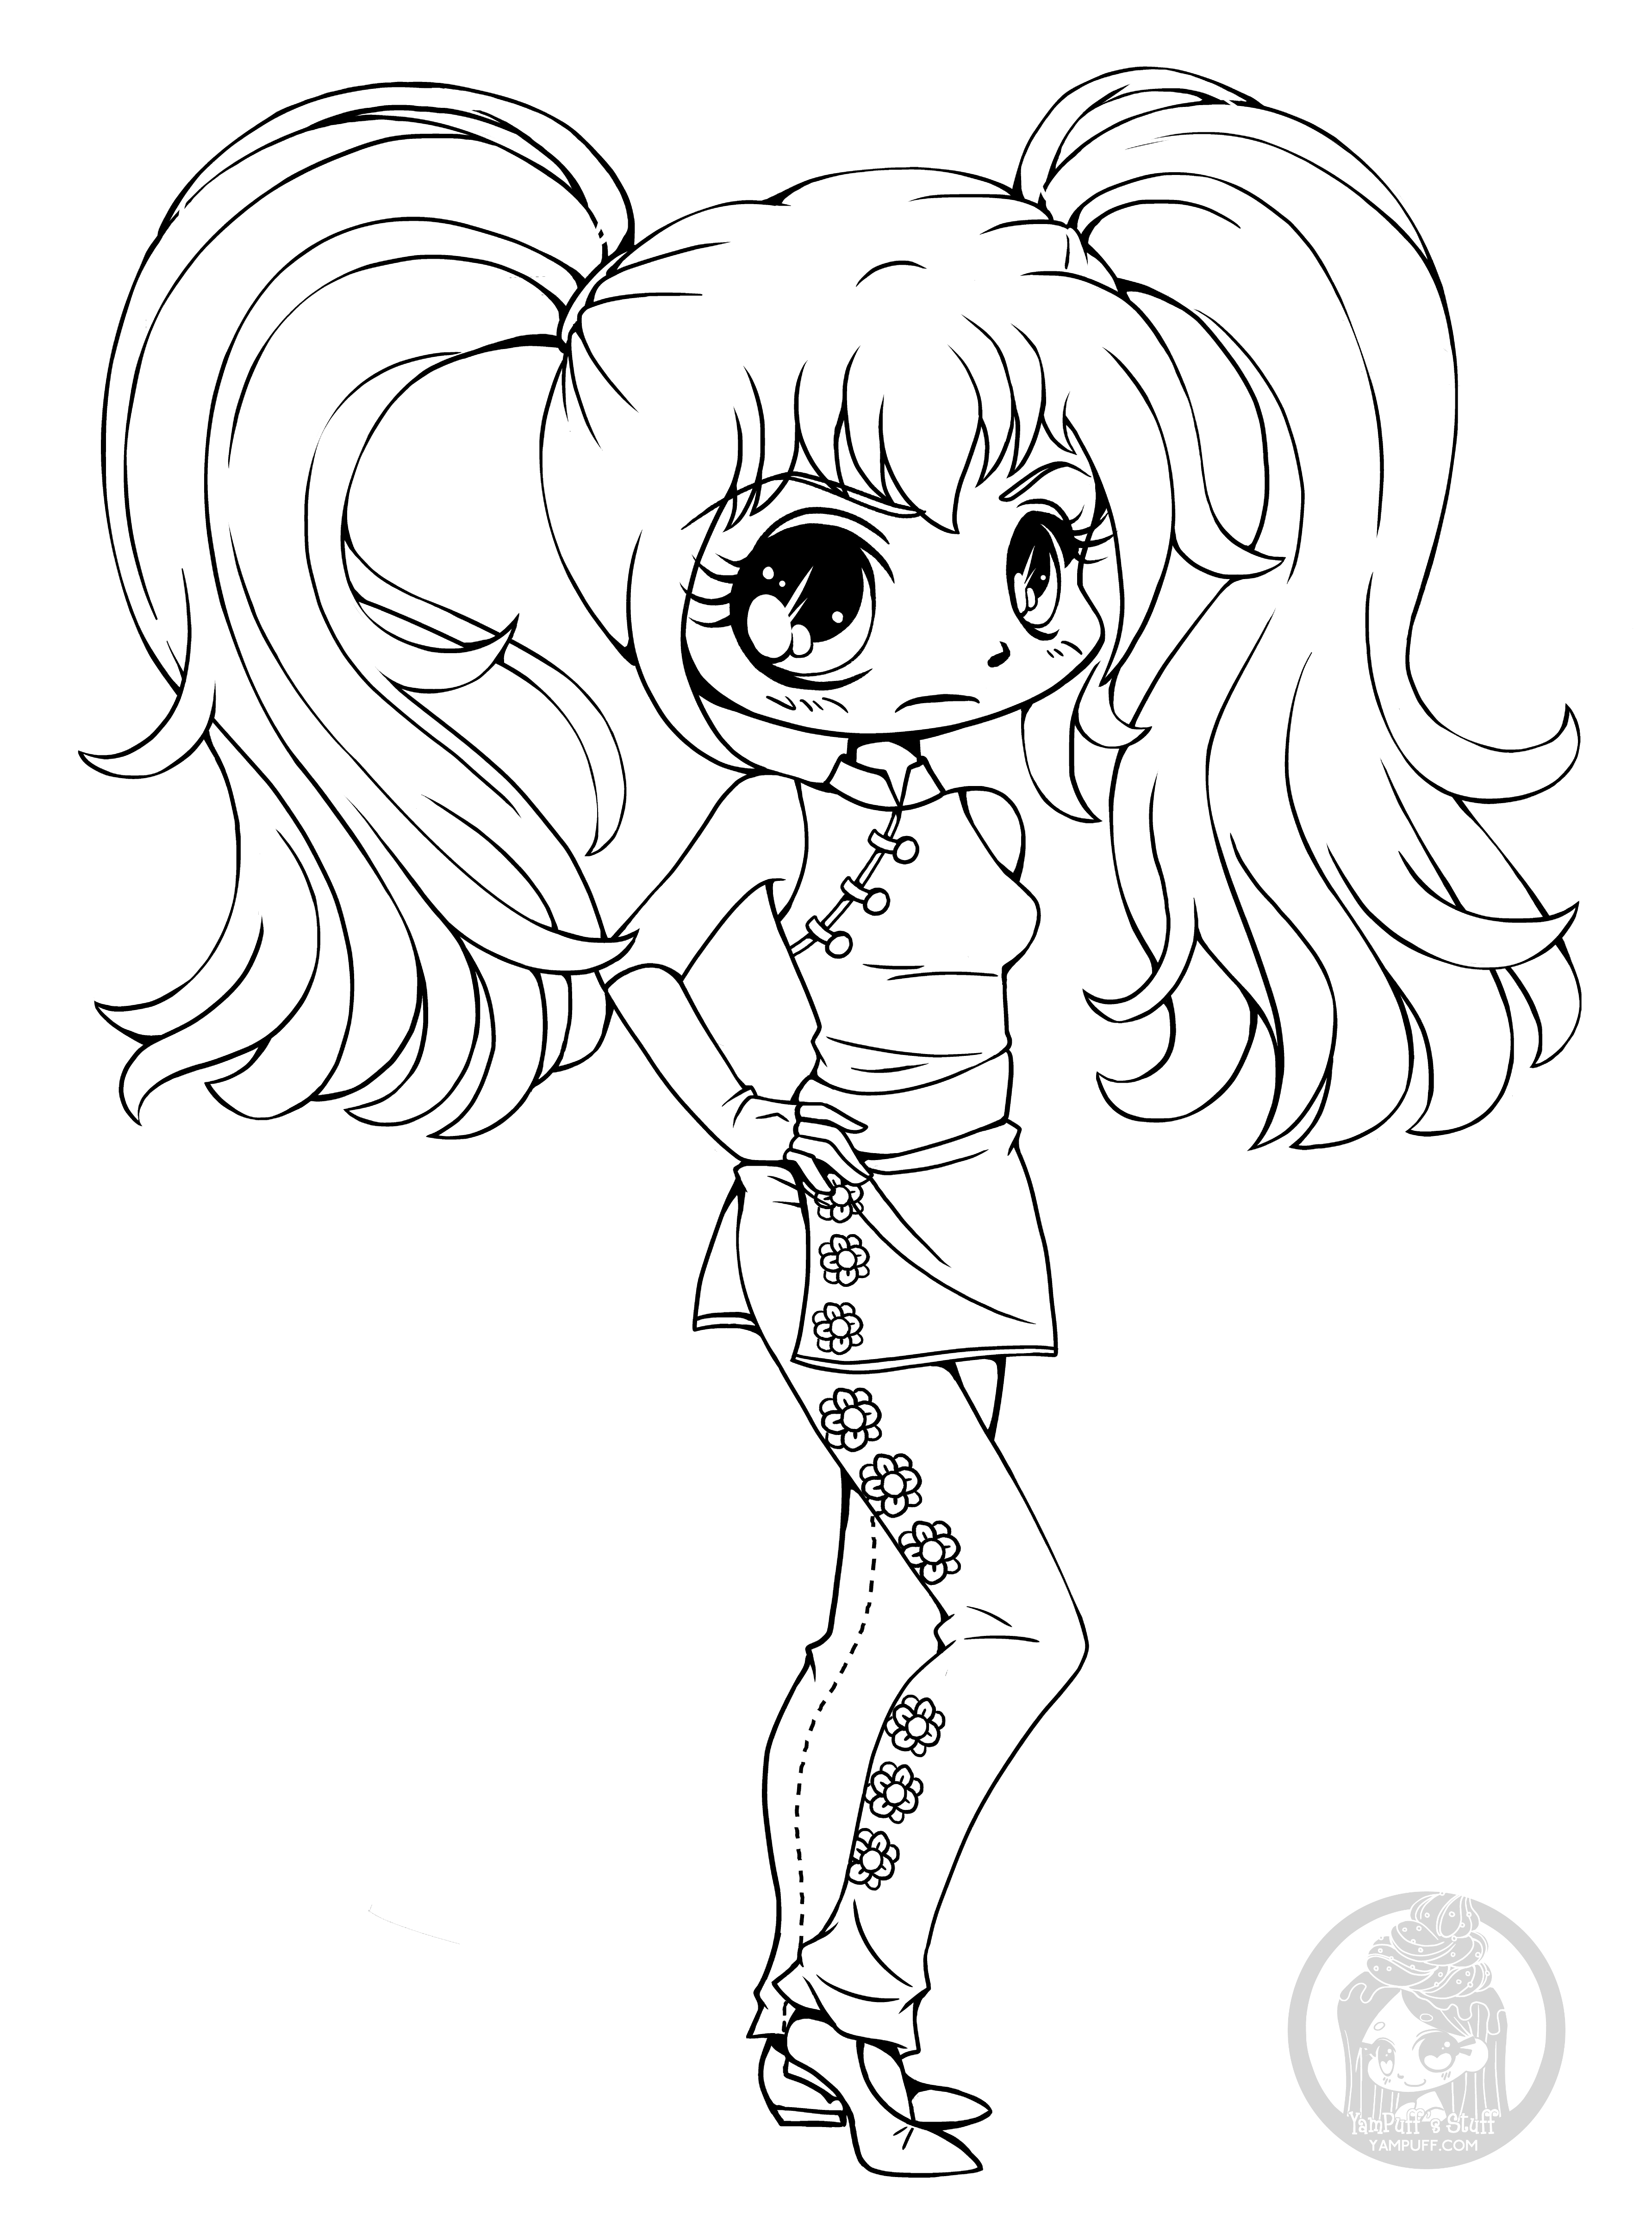 Chibis - Free Chibi Coloring Pages • YamPuff's Stuff